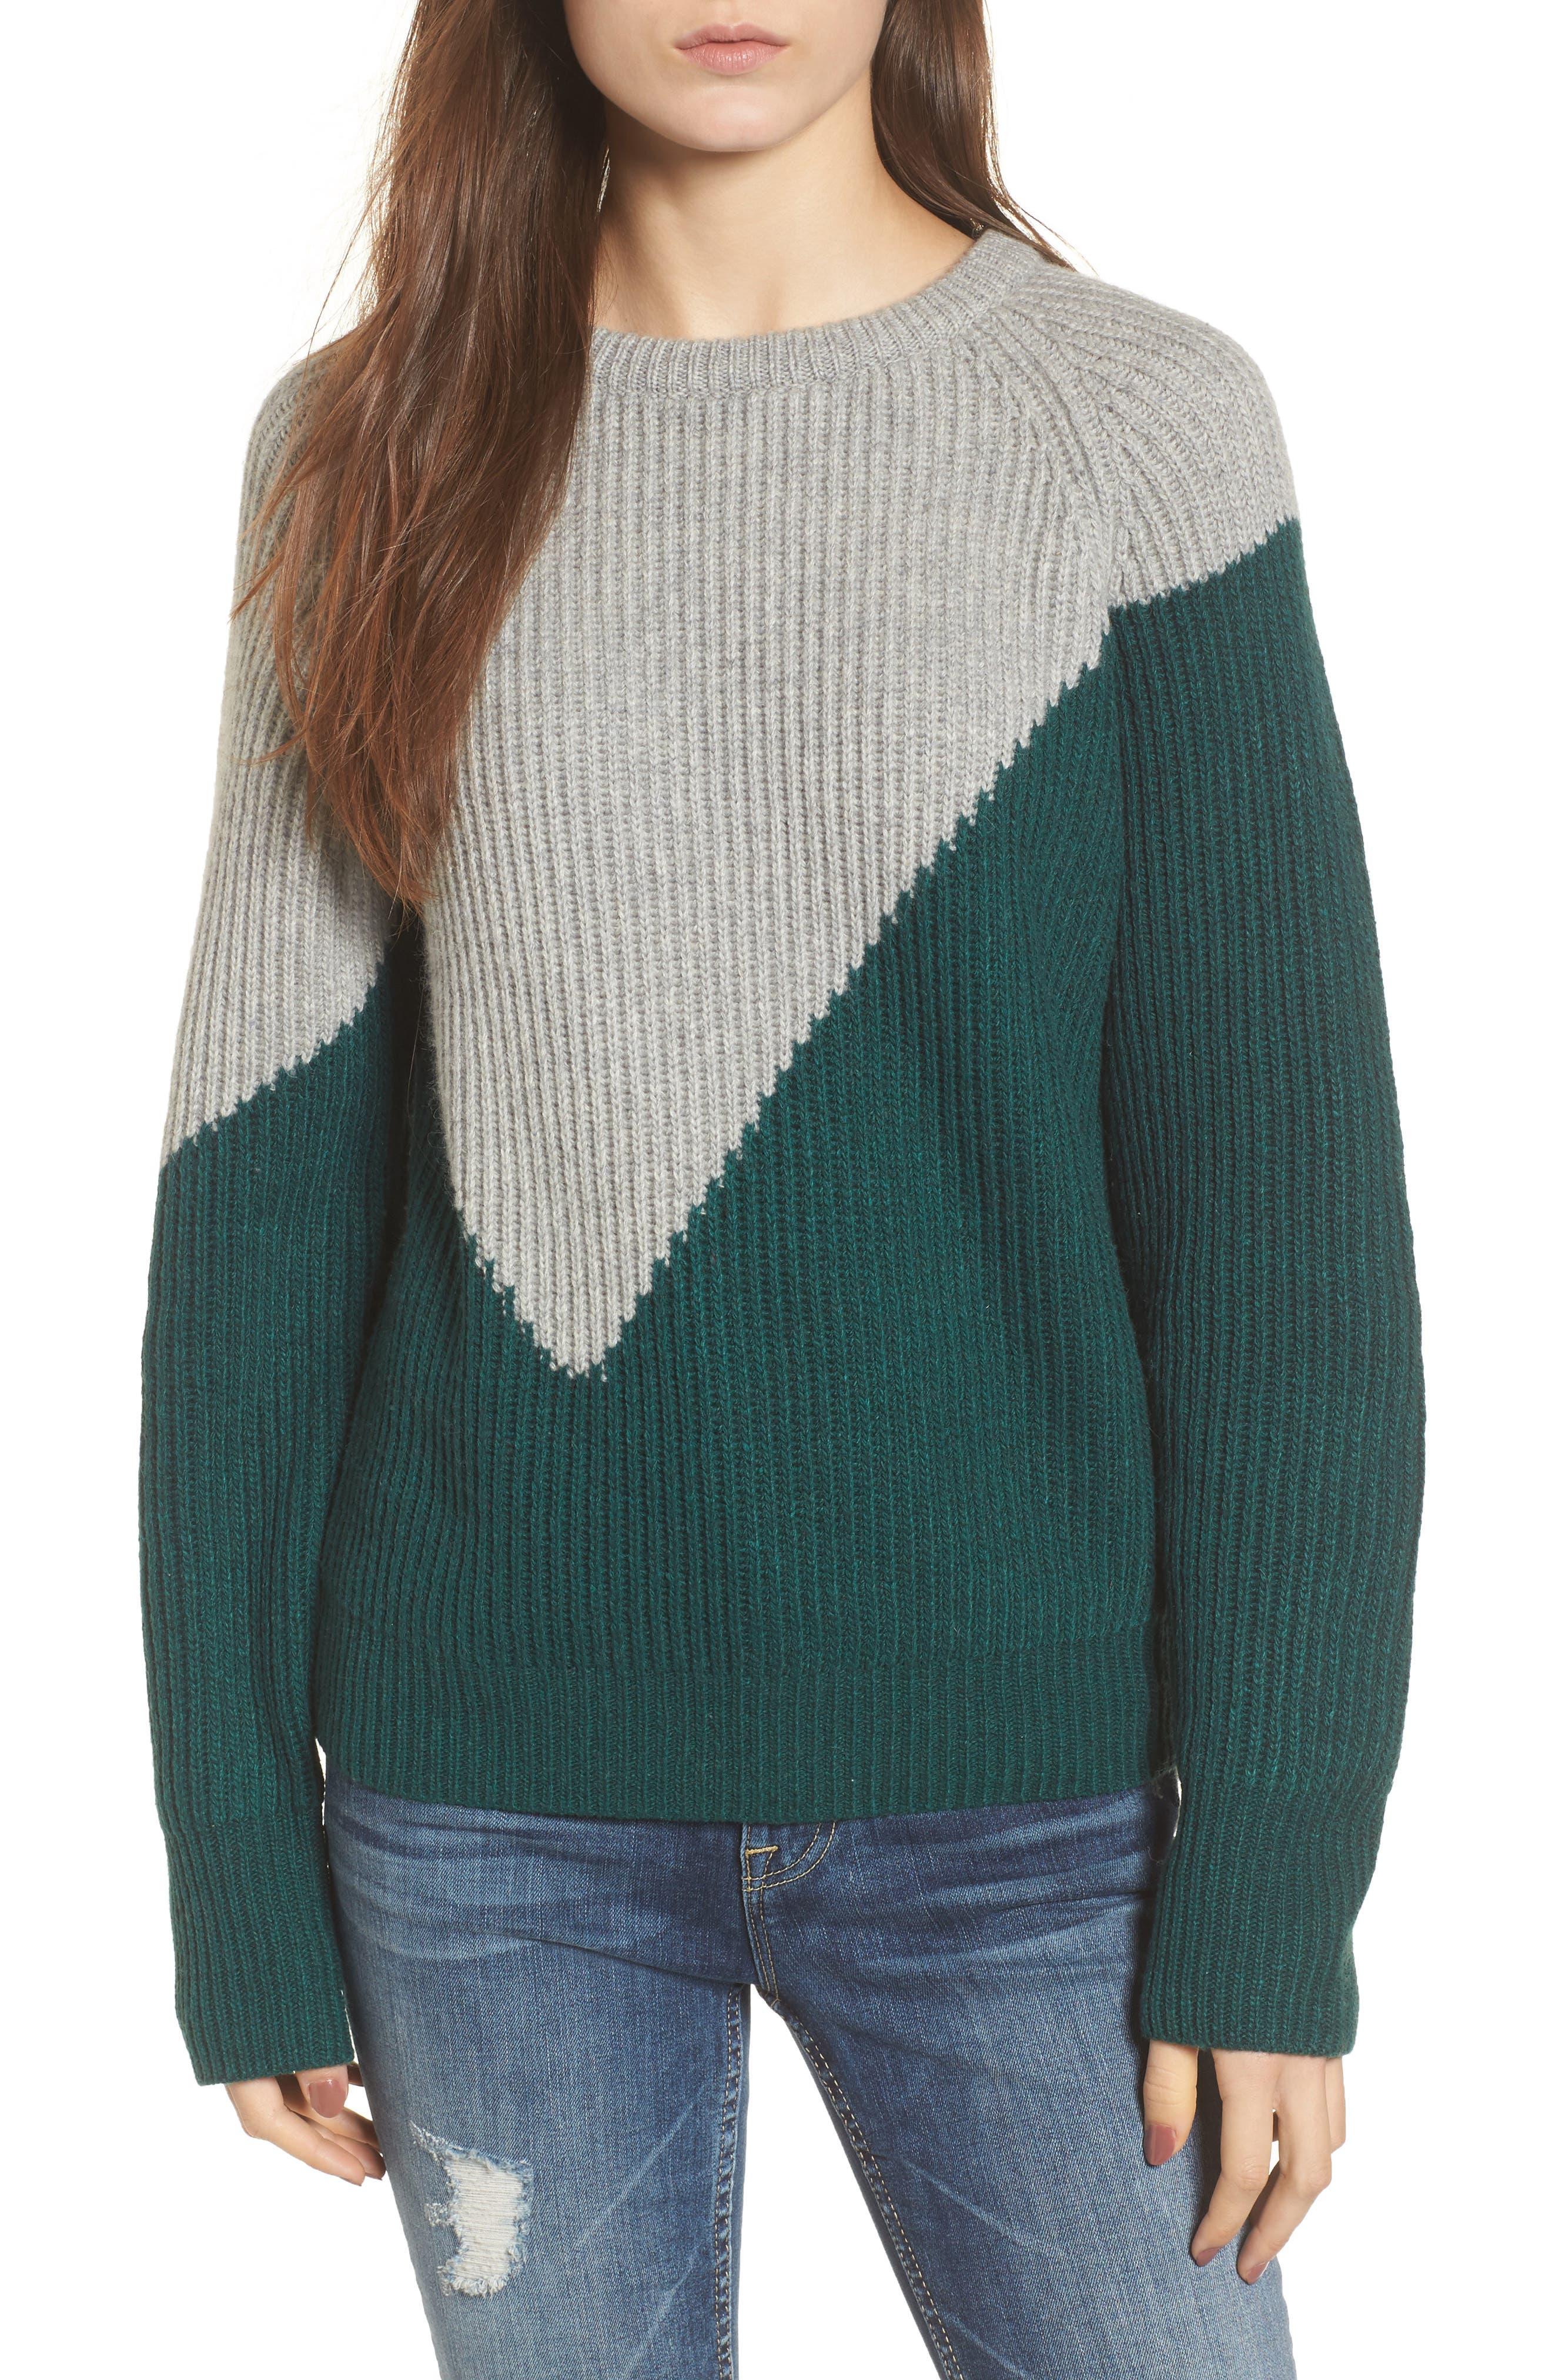 EVIDNT Unbalanced Pattern Wool Blend Sweater